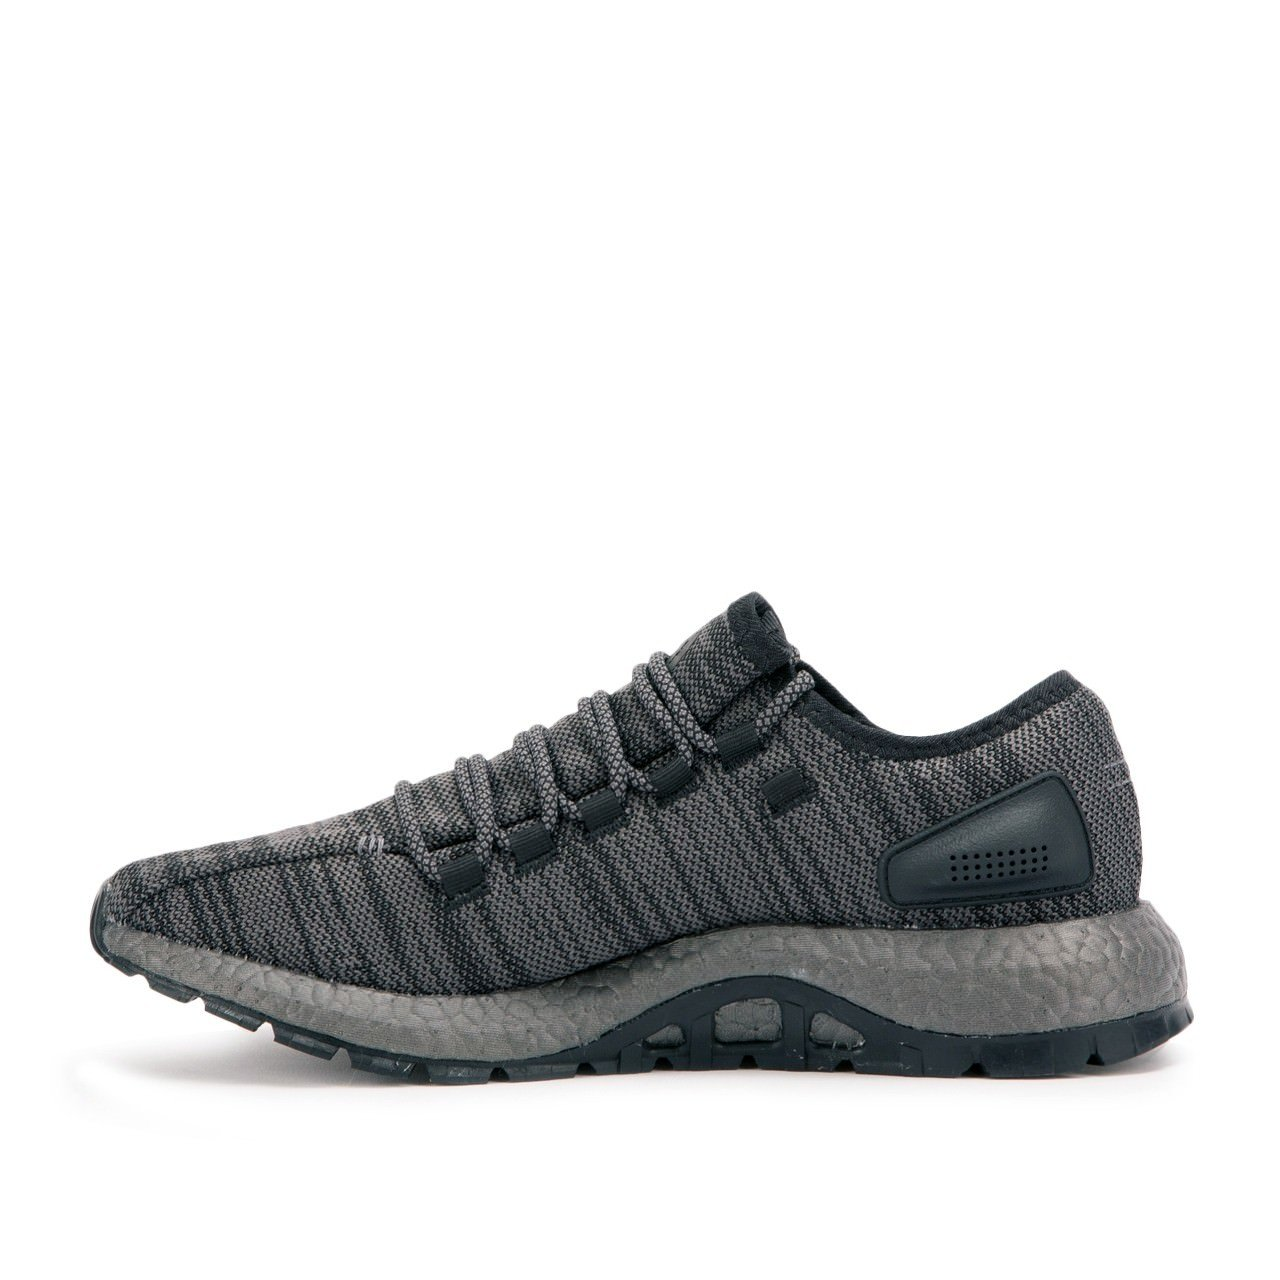 209efad098947 Galleon - Adidas Men s Pureboost ATR Running Shoe